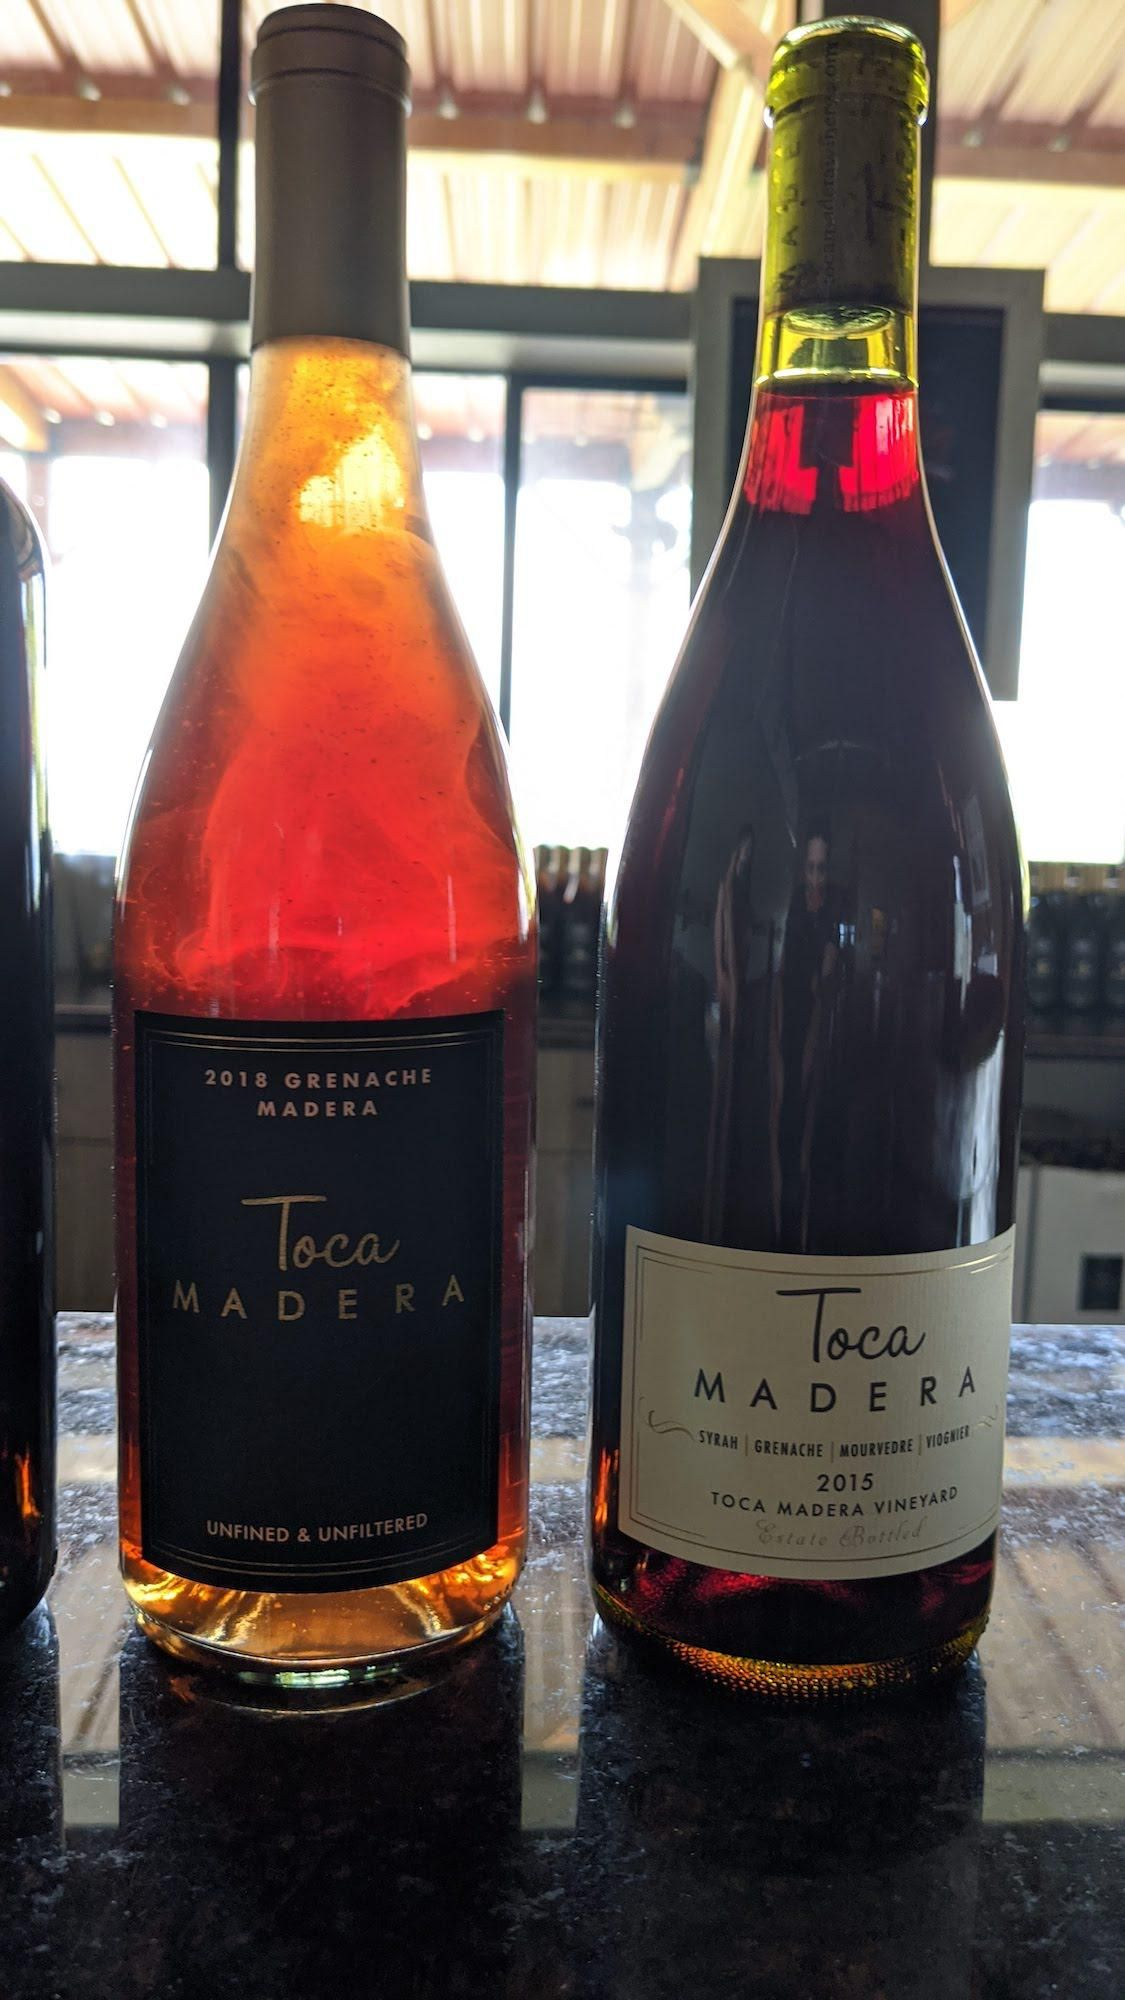 2018 Grenache And 2015 Gsm Toca Madera From Where Madera Ca Athan Zafirov In 2020 Wine Recipes Grenache Madera